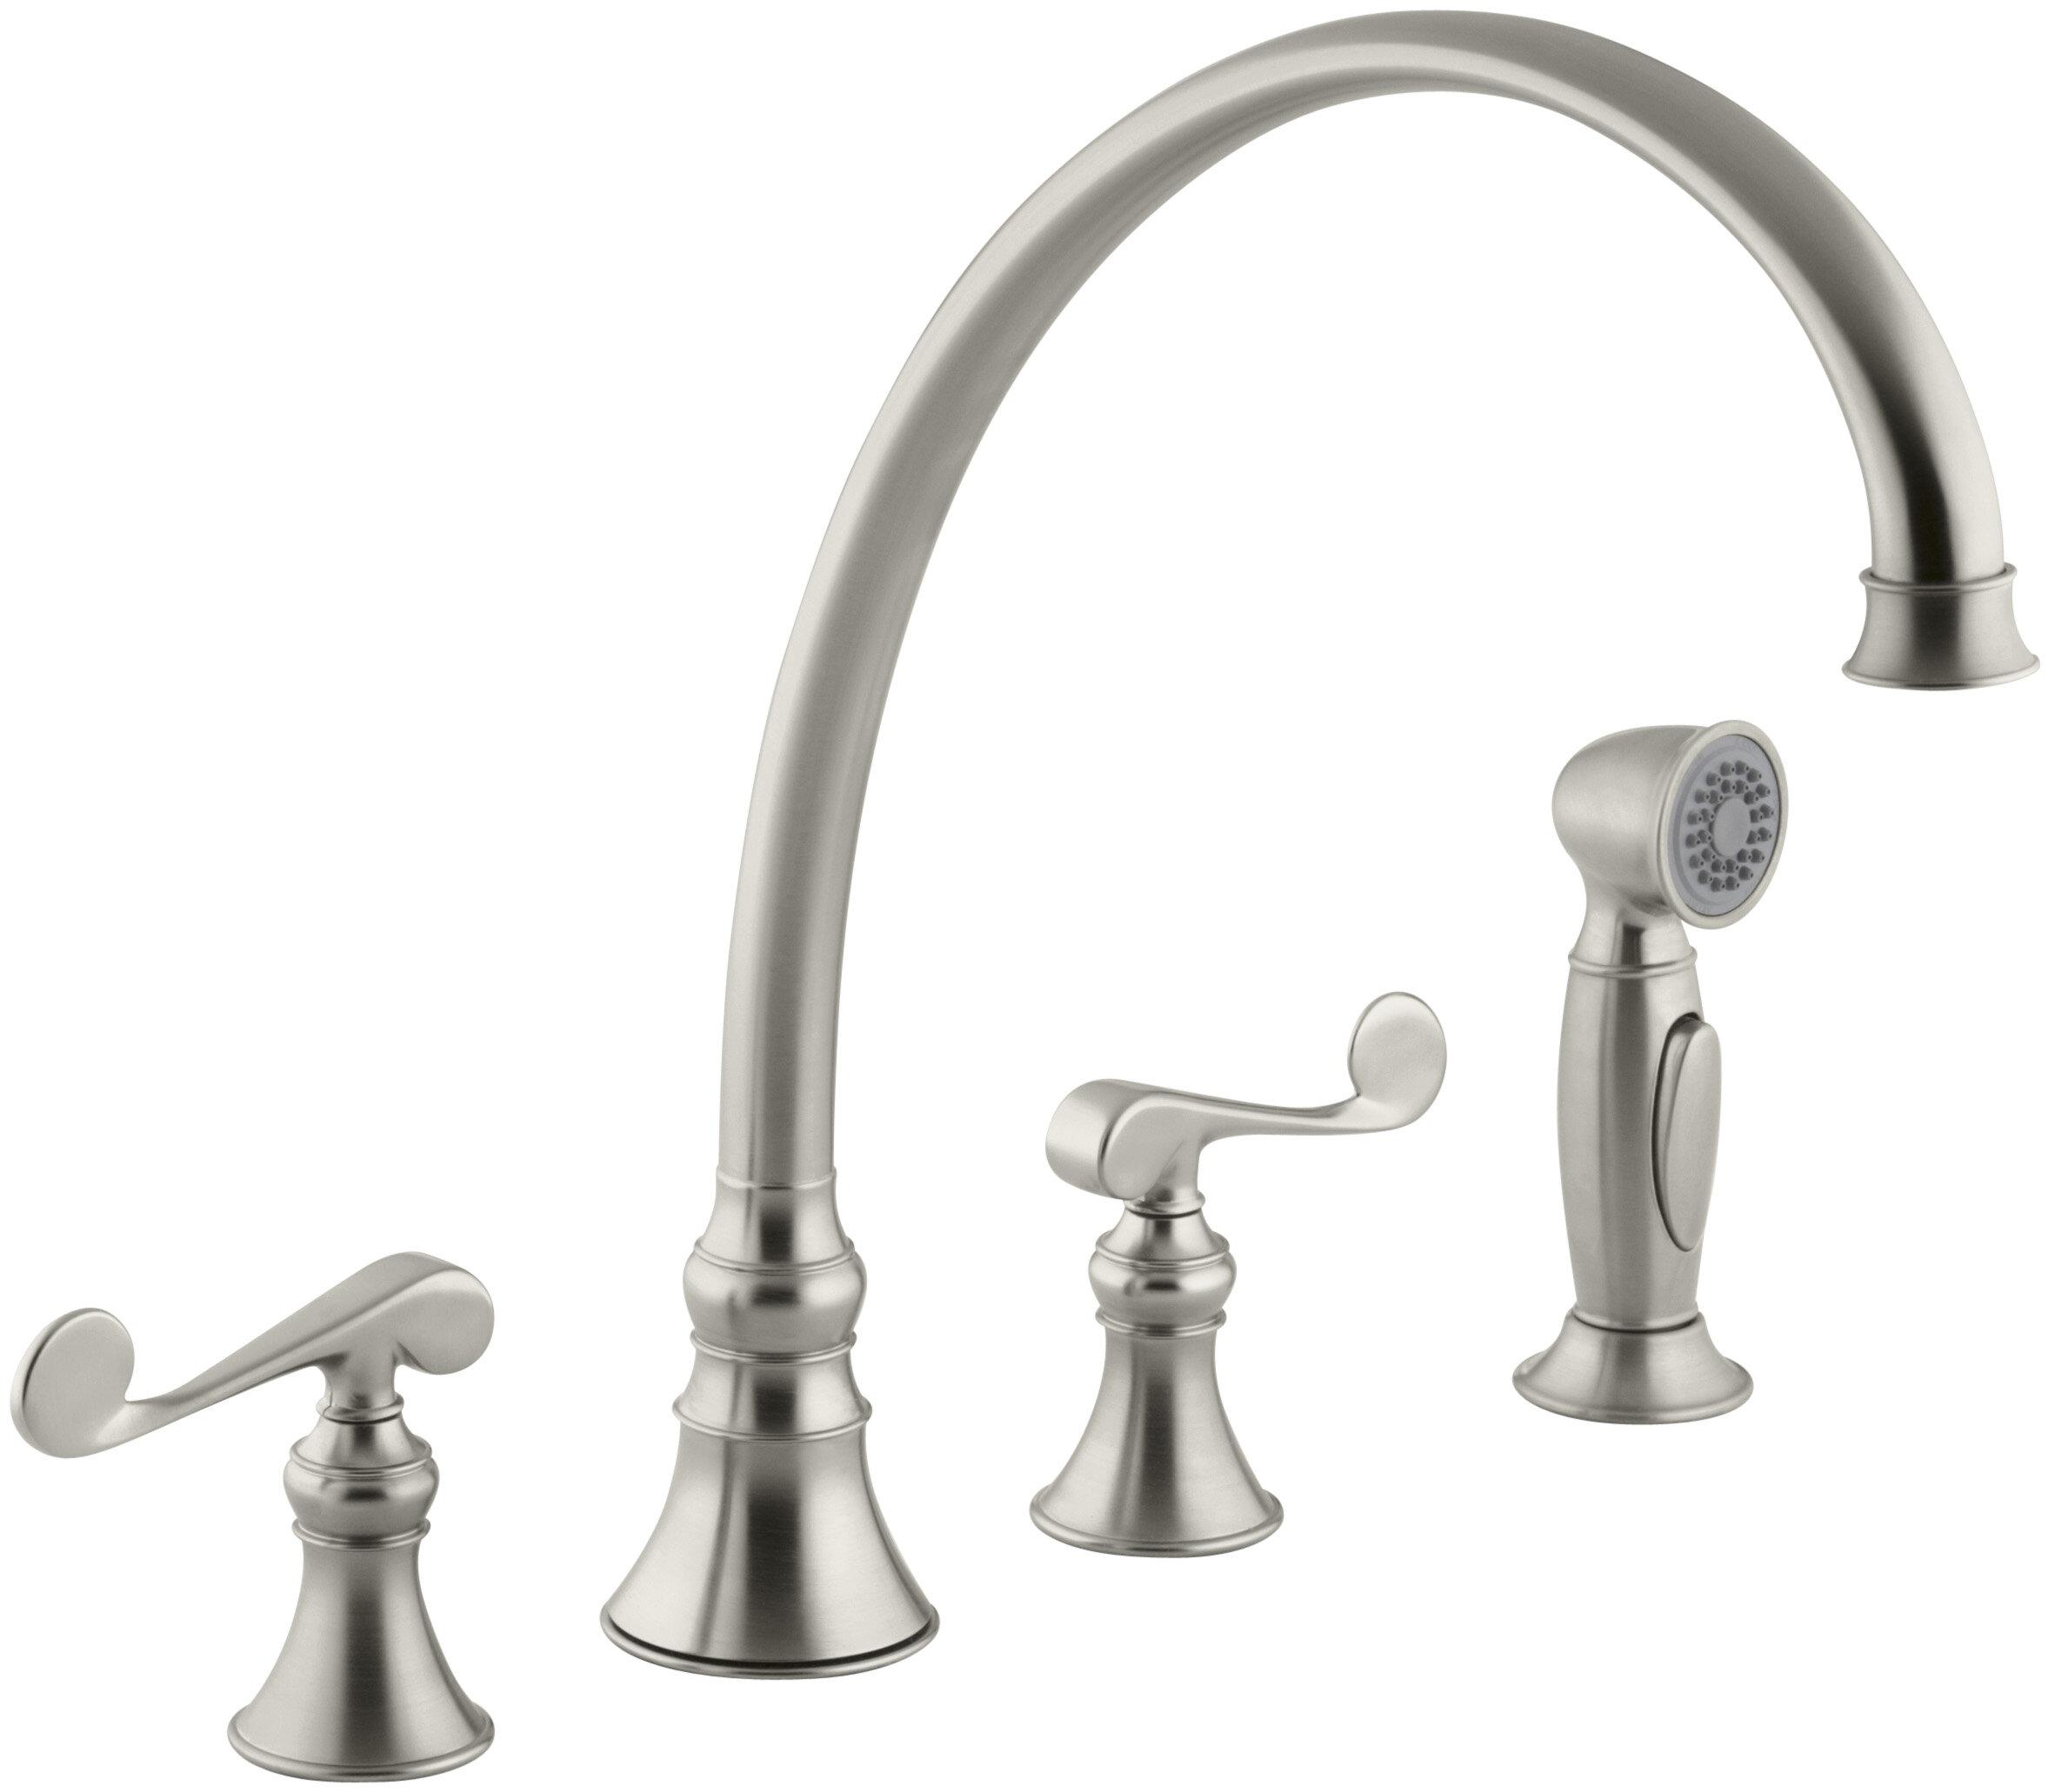 K 16111 4 Bn Bv Cp Kohler Revival 4 Hole Kitchen Sink Faucet With 11